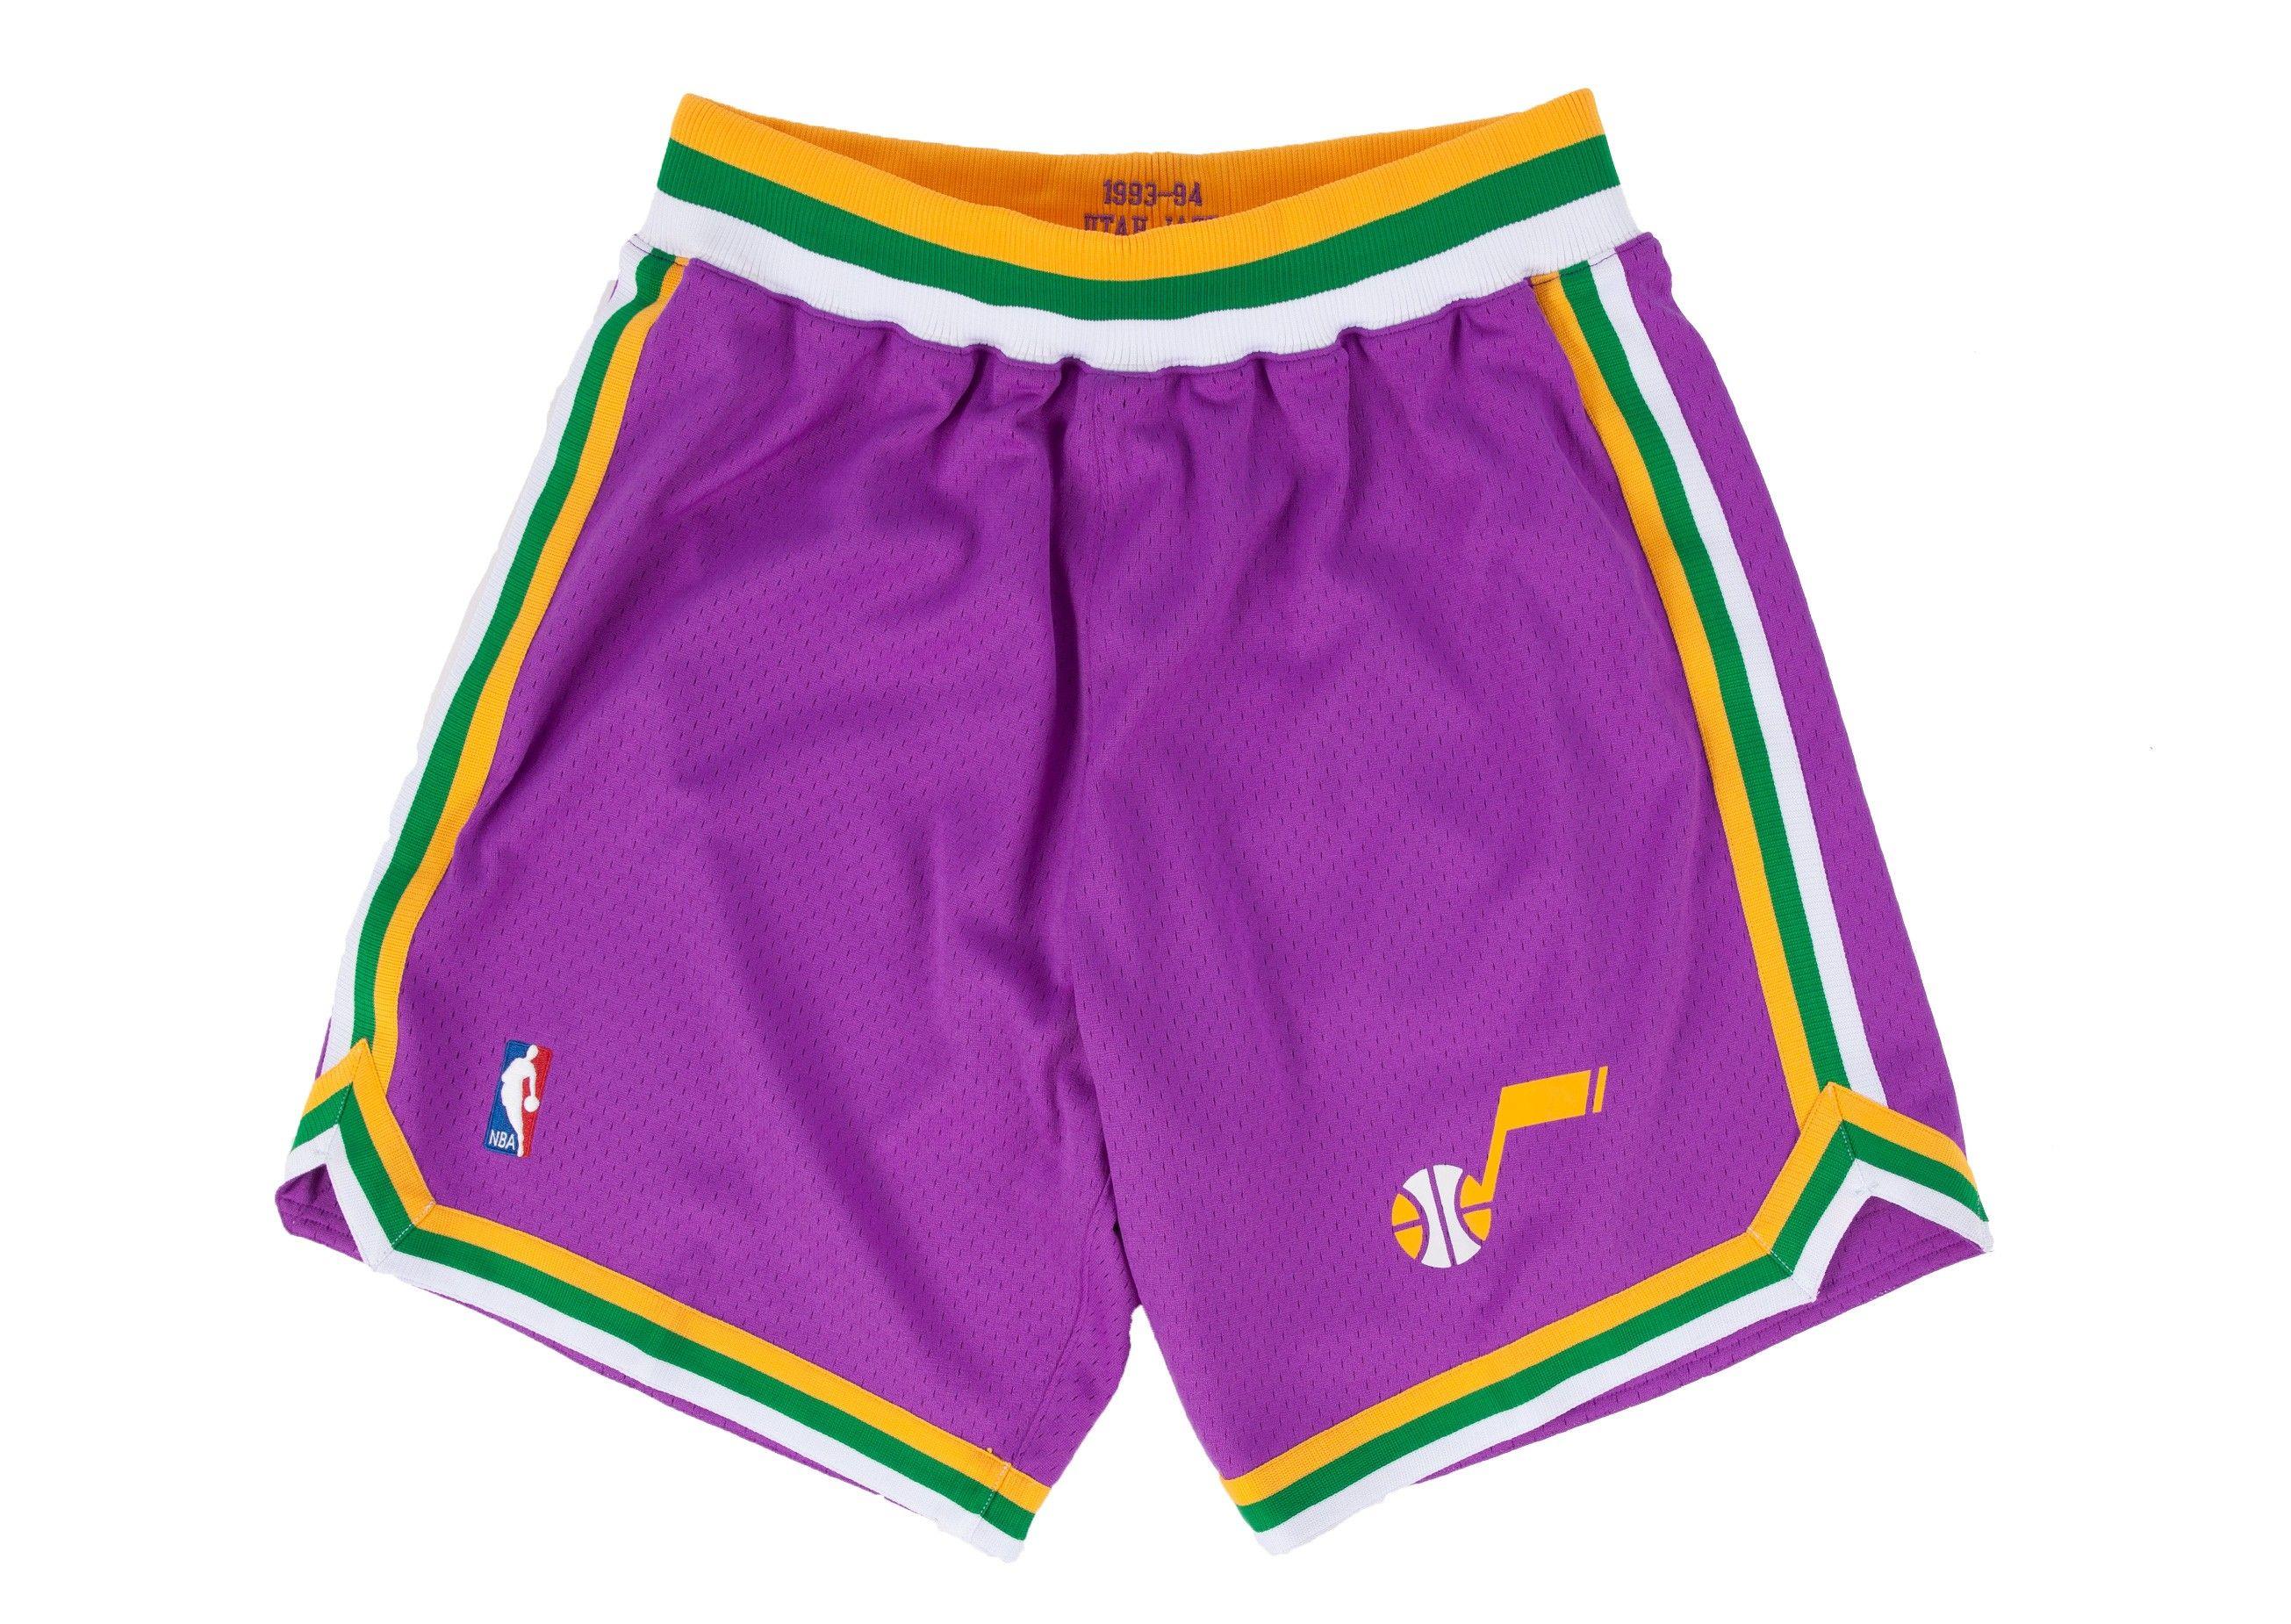 1993-94 Authentic Shorts Utah Jazz  42ca4cce3